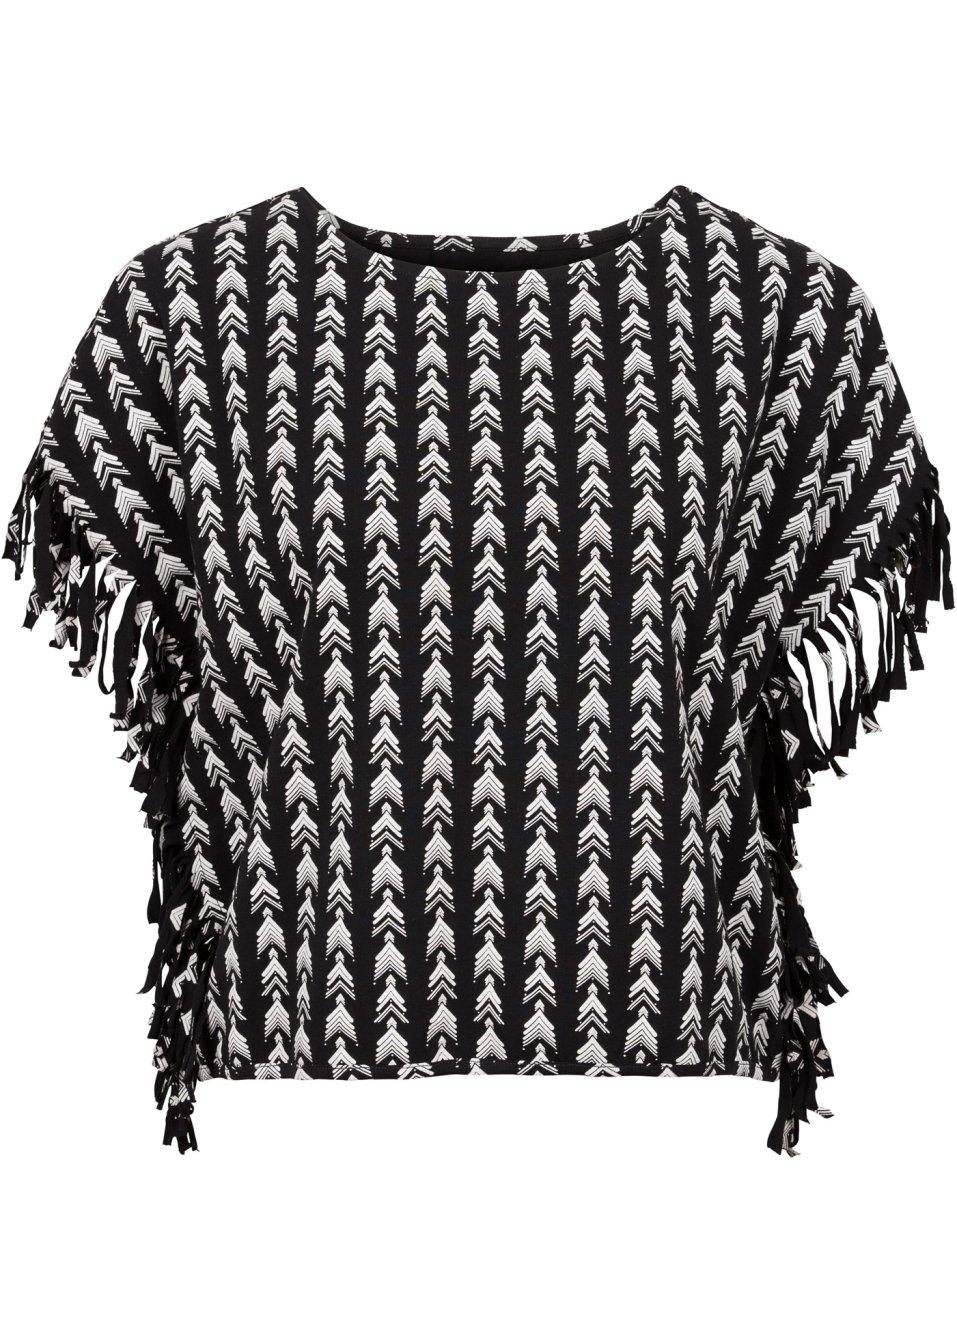 kurzes shirt mit fransen schwarz bedruckt. Black Bedroom Furniture Sets. Home Design Ideas